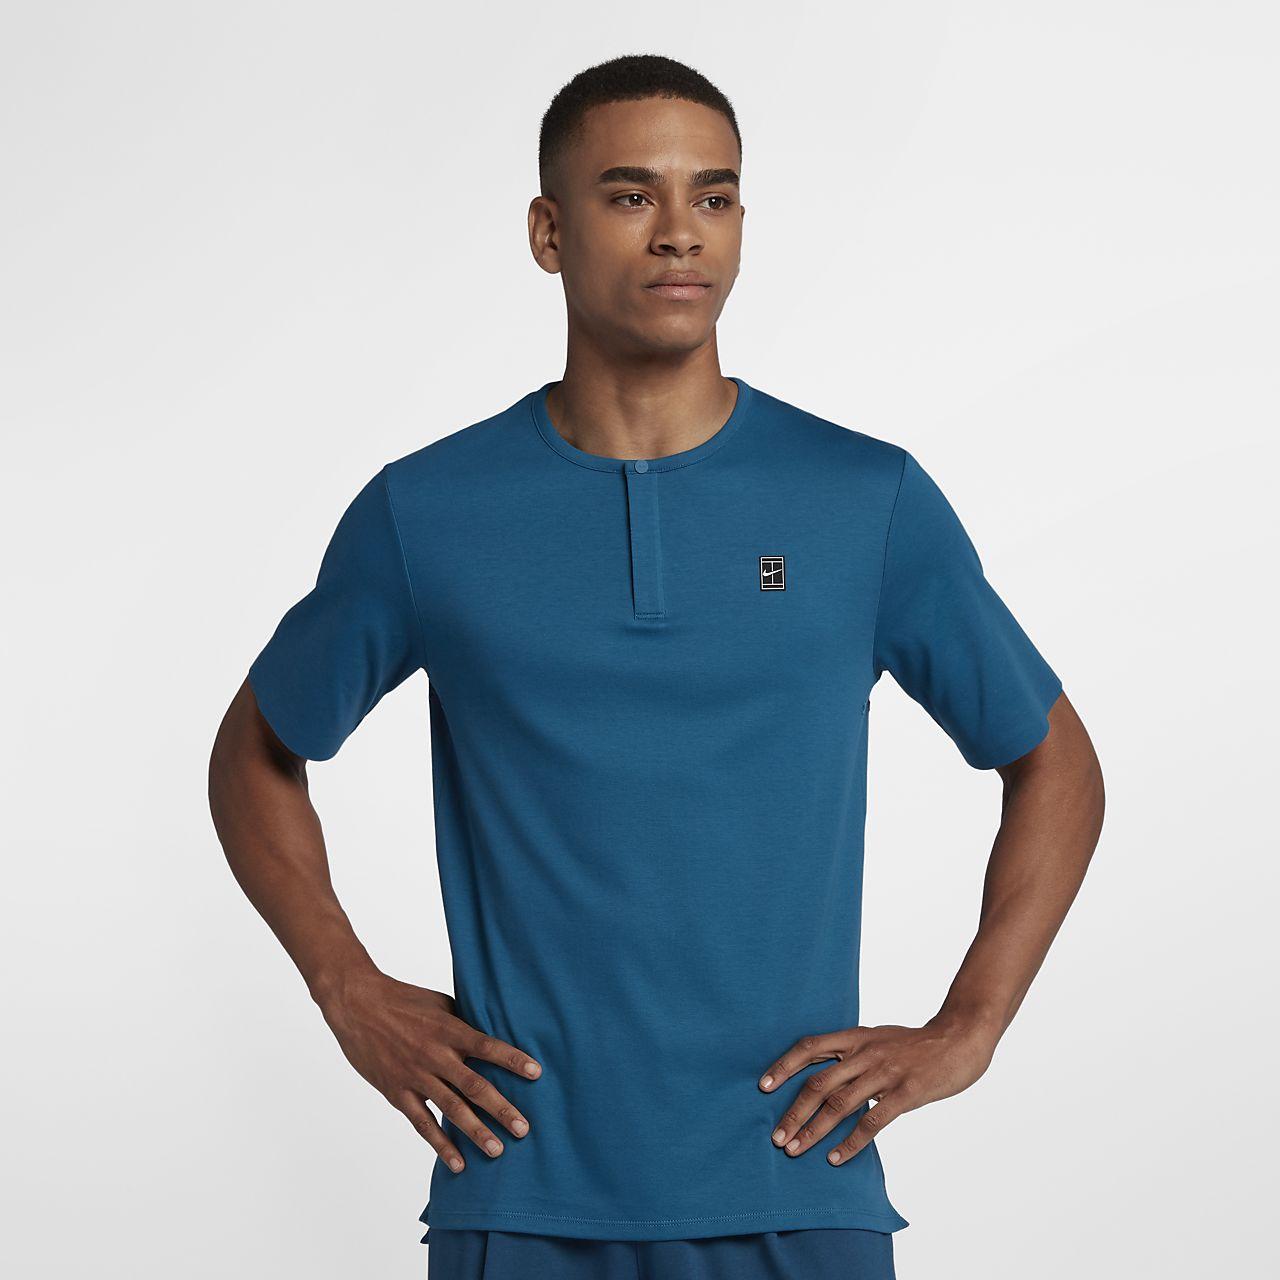 40a0536b89e3 Pánské tenisové tričko s krátkým rukávem NikeCourt. Nike.com CZ